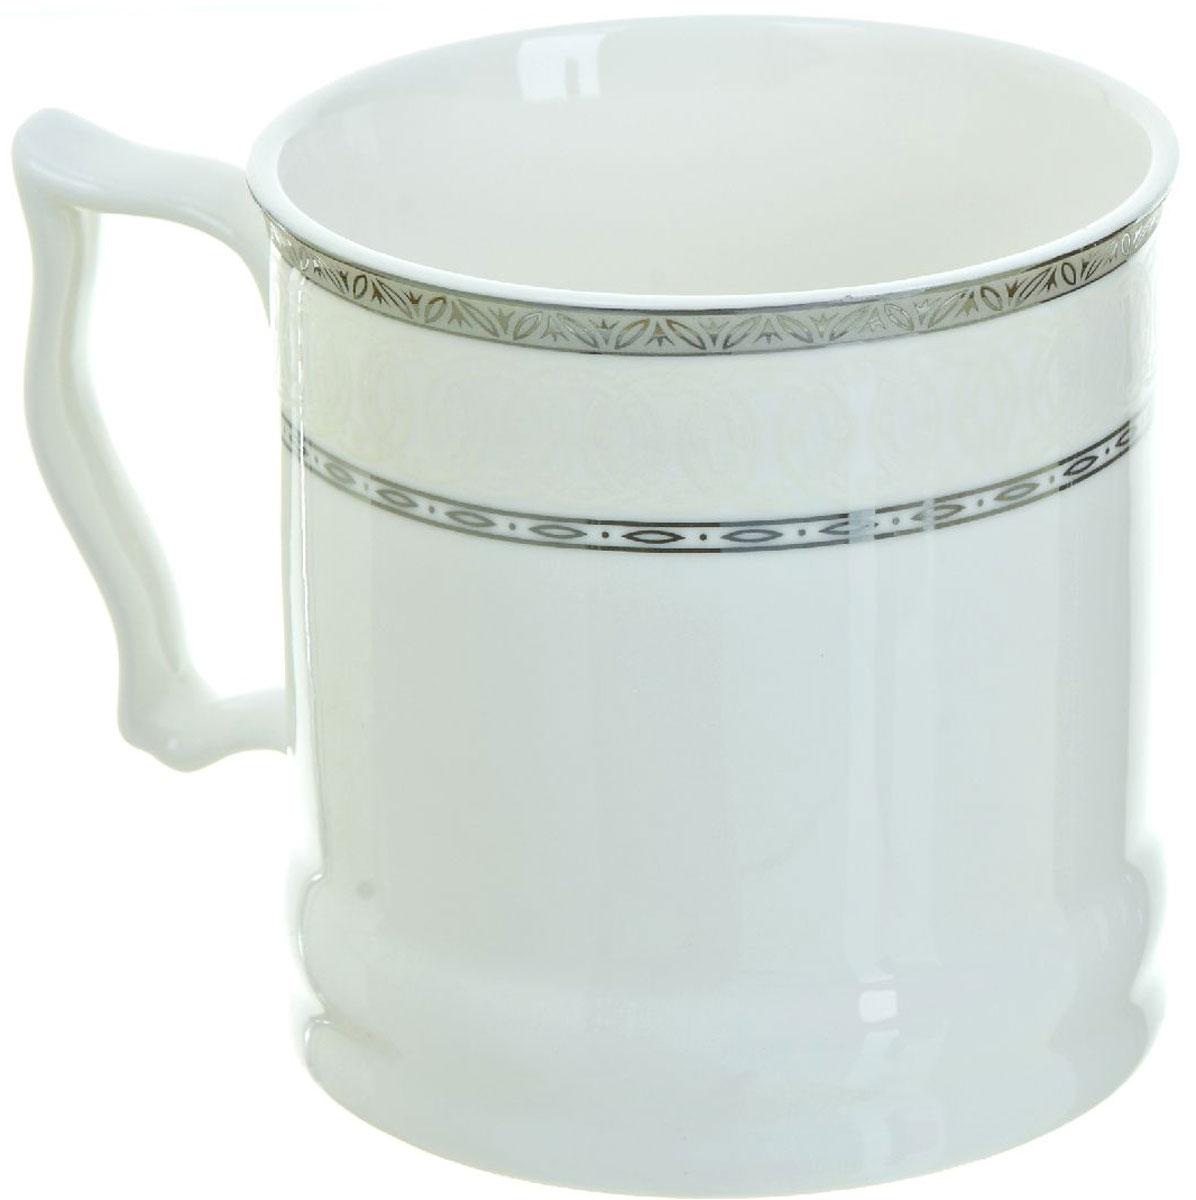 Кружка BHP Королевская кружка, 500 мл. 1870006 кружка amber porcelain сердечки 220 мл